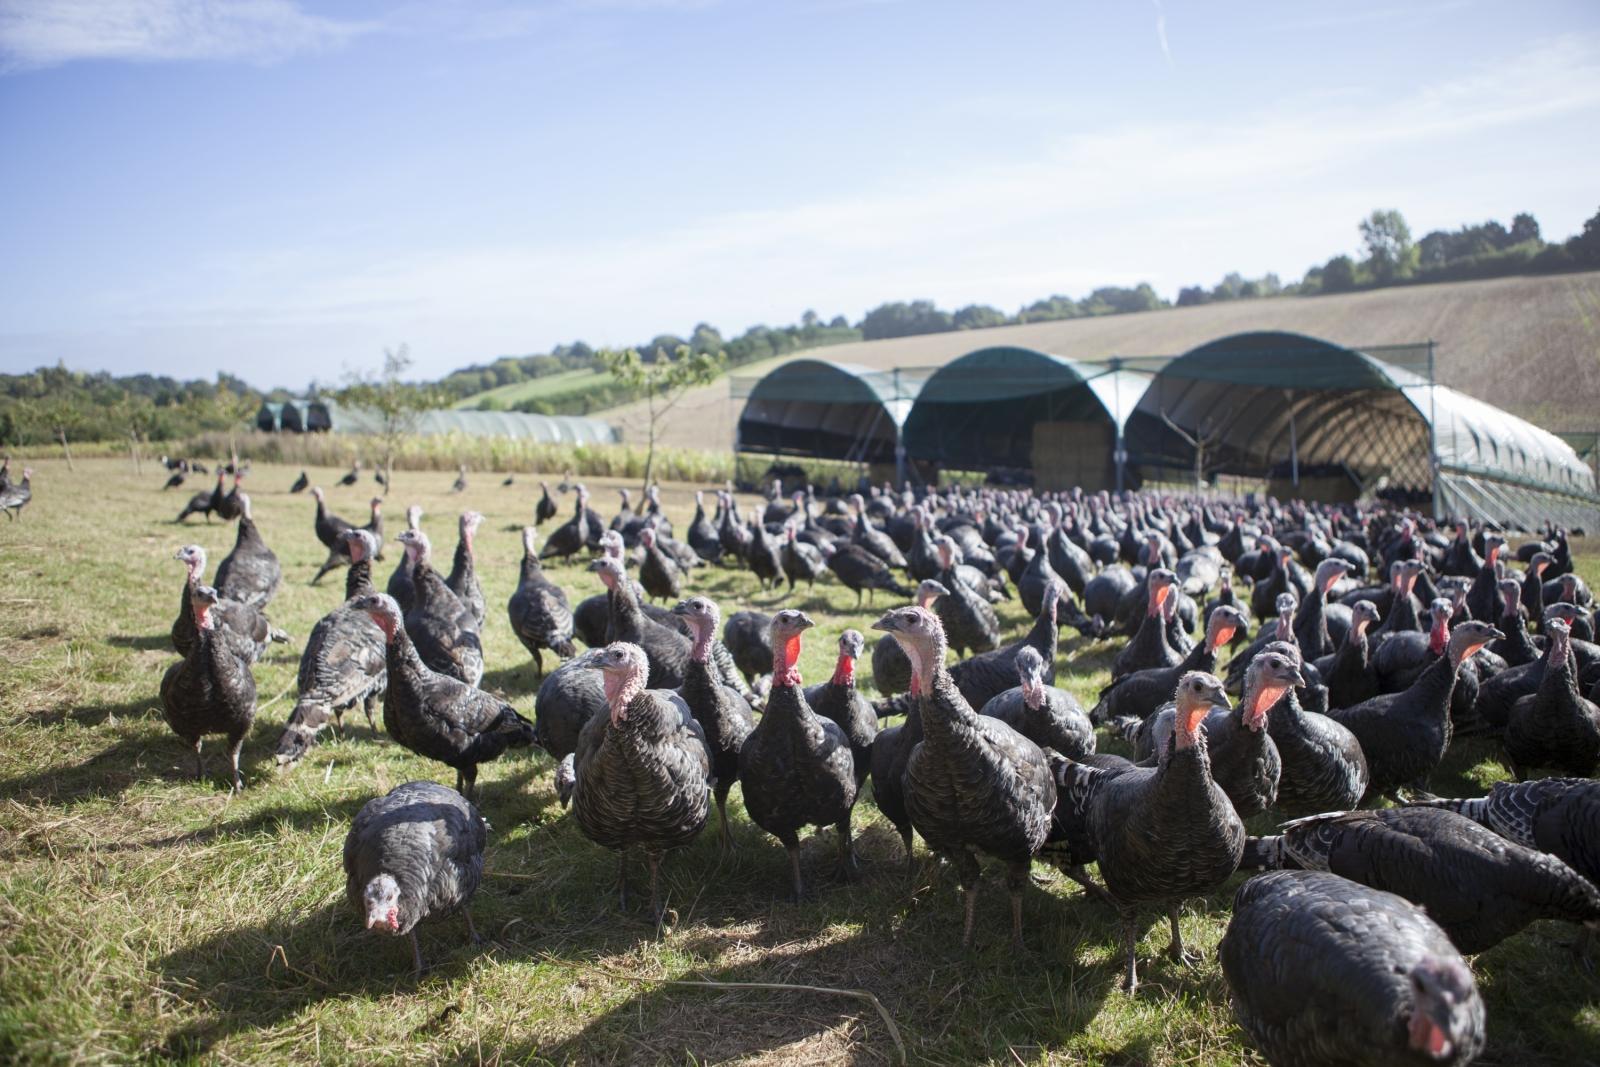 Turkeys roaming the farm